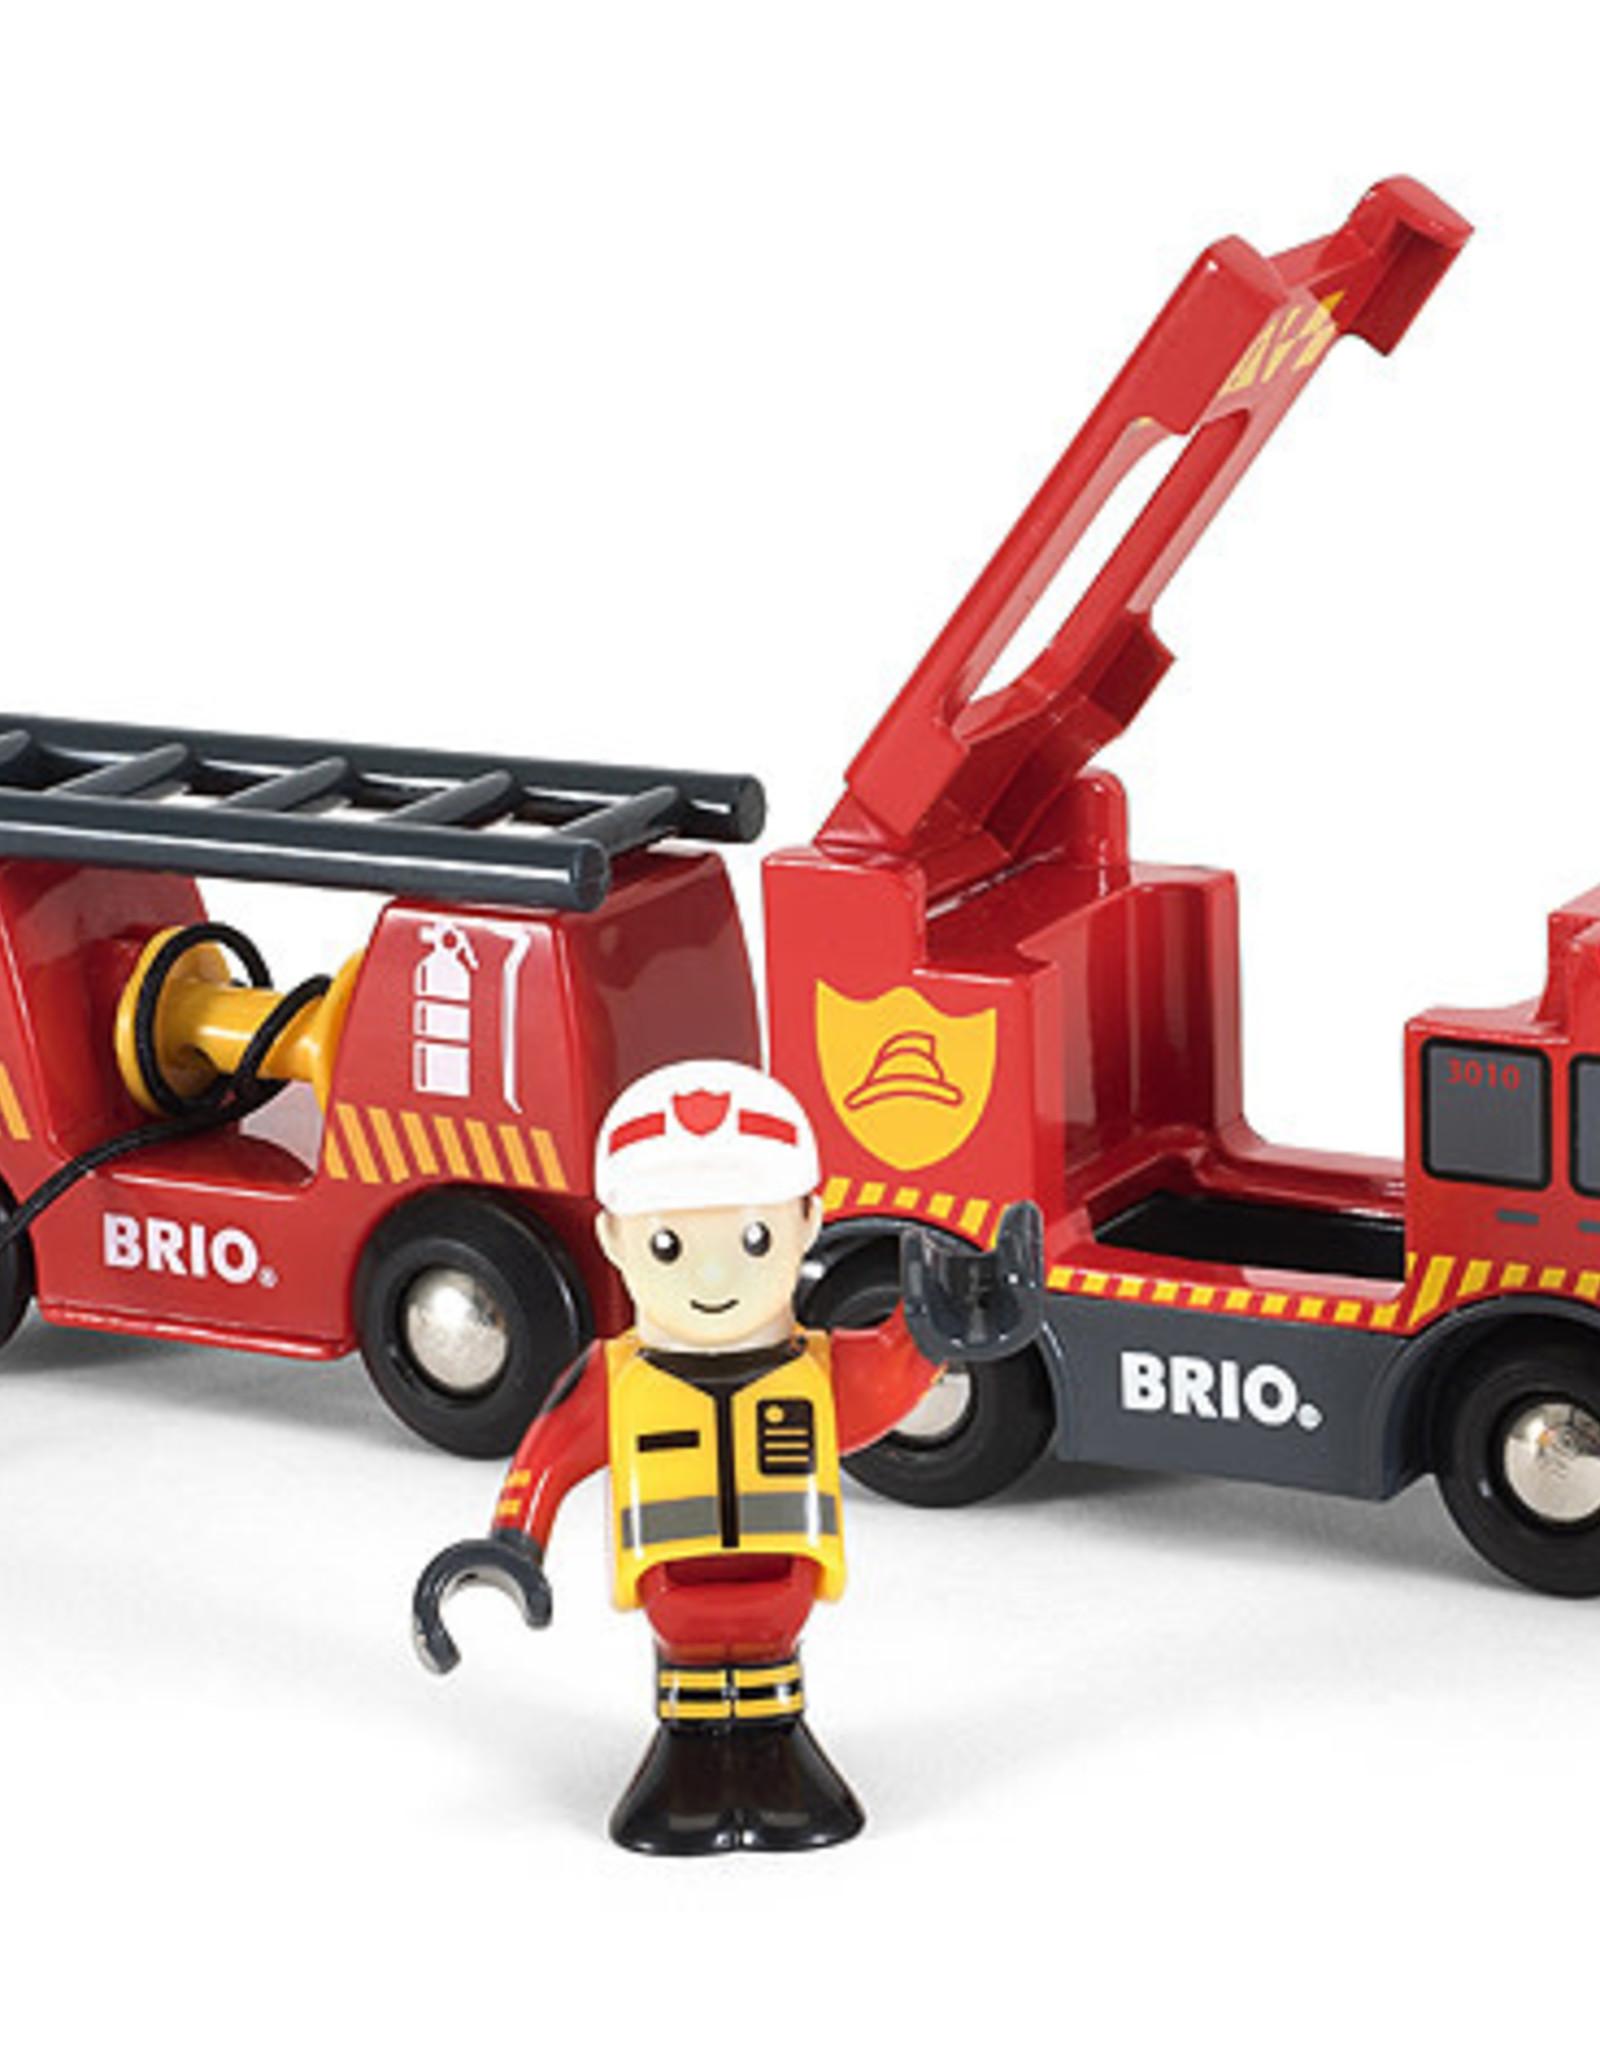 Brio Emergency Fire Engine